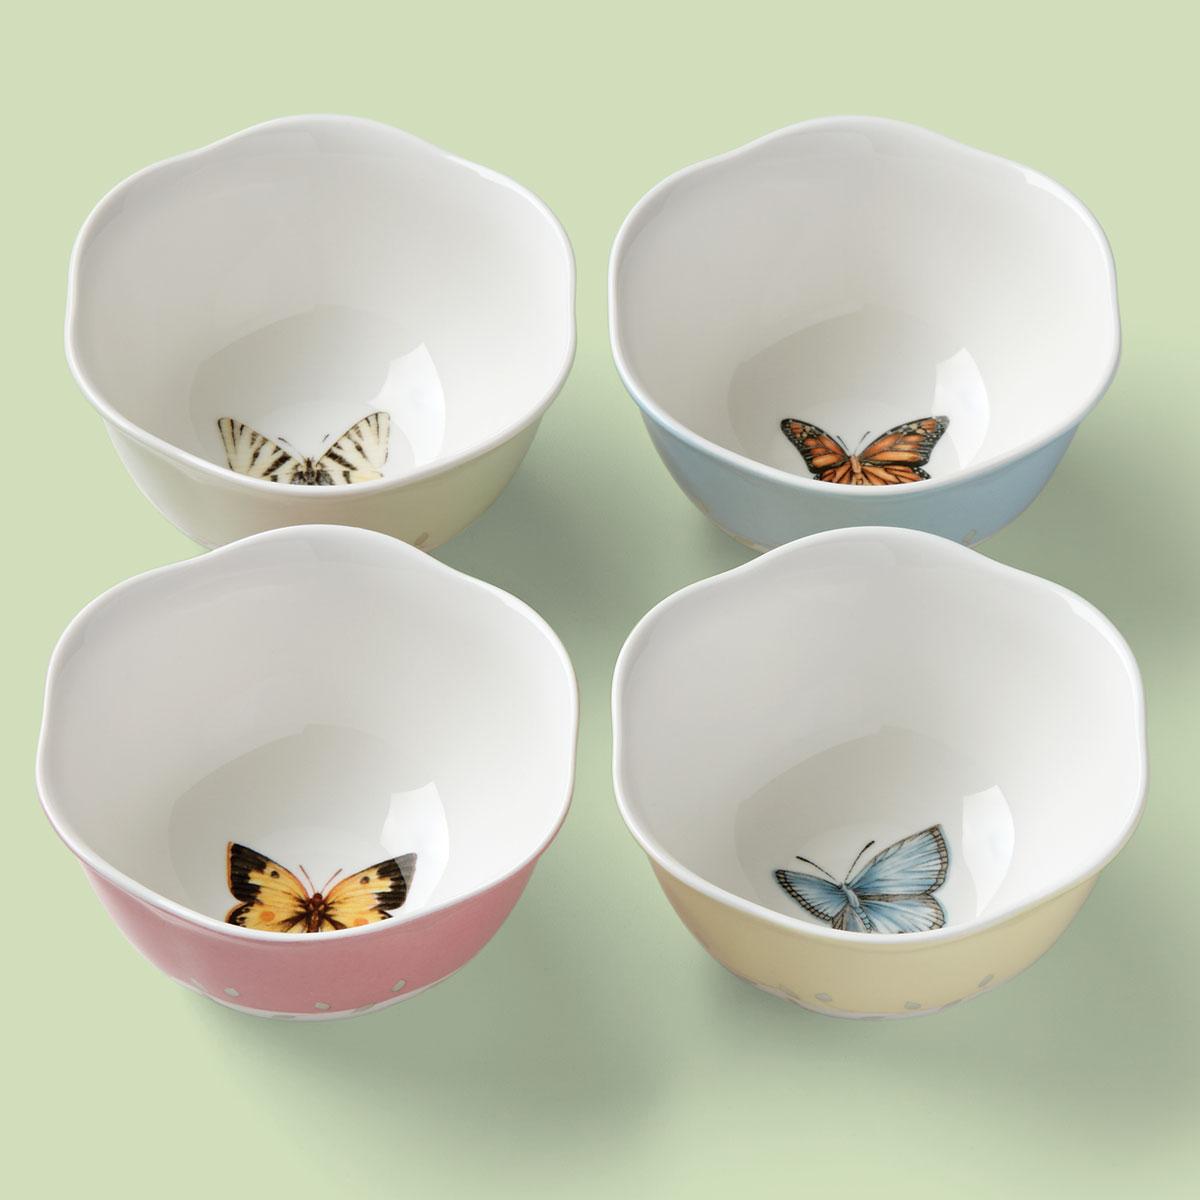 Lenox Butterfly Meadow Dinnerware Dessert Bowls Set Of Four